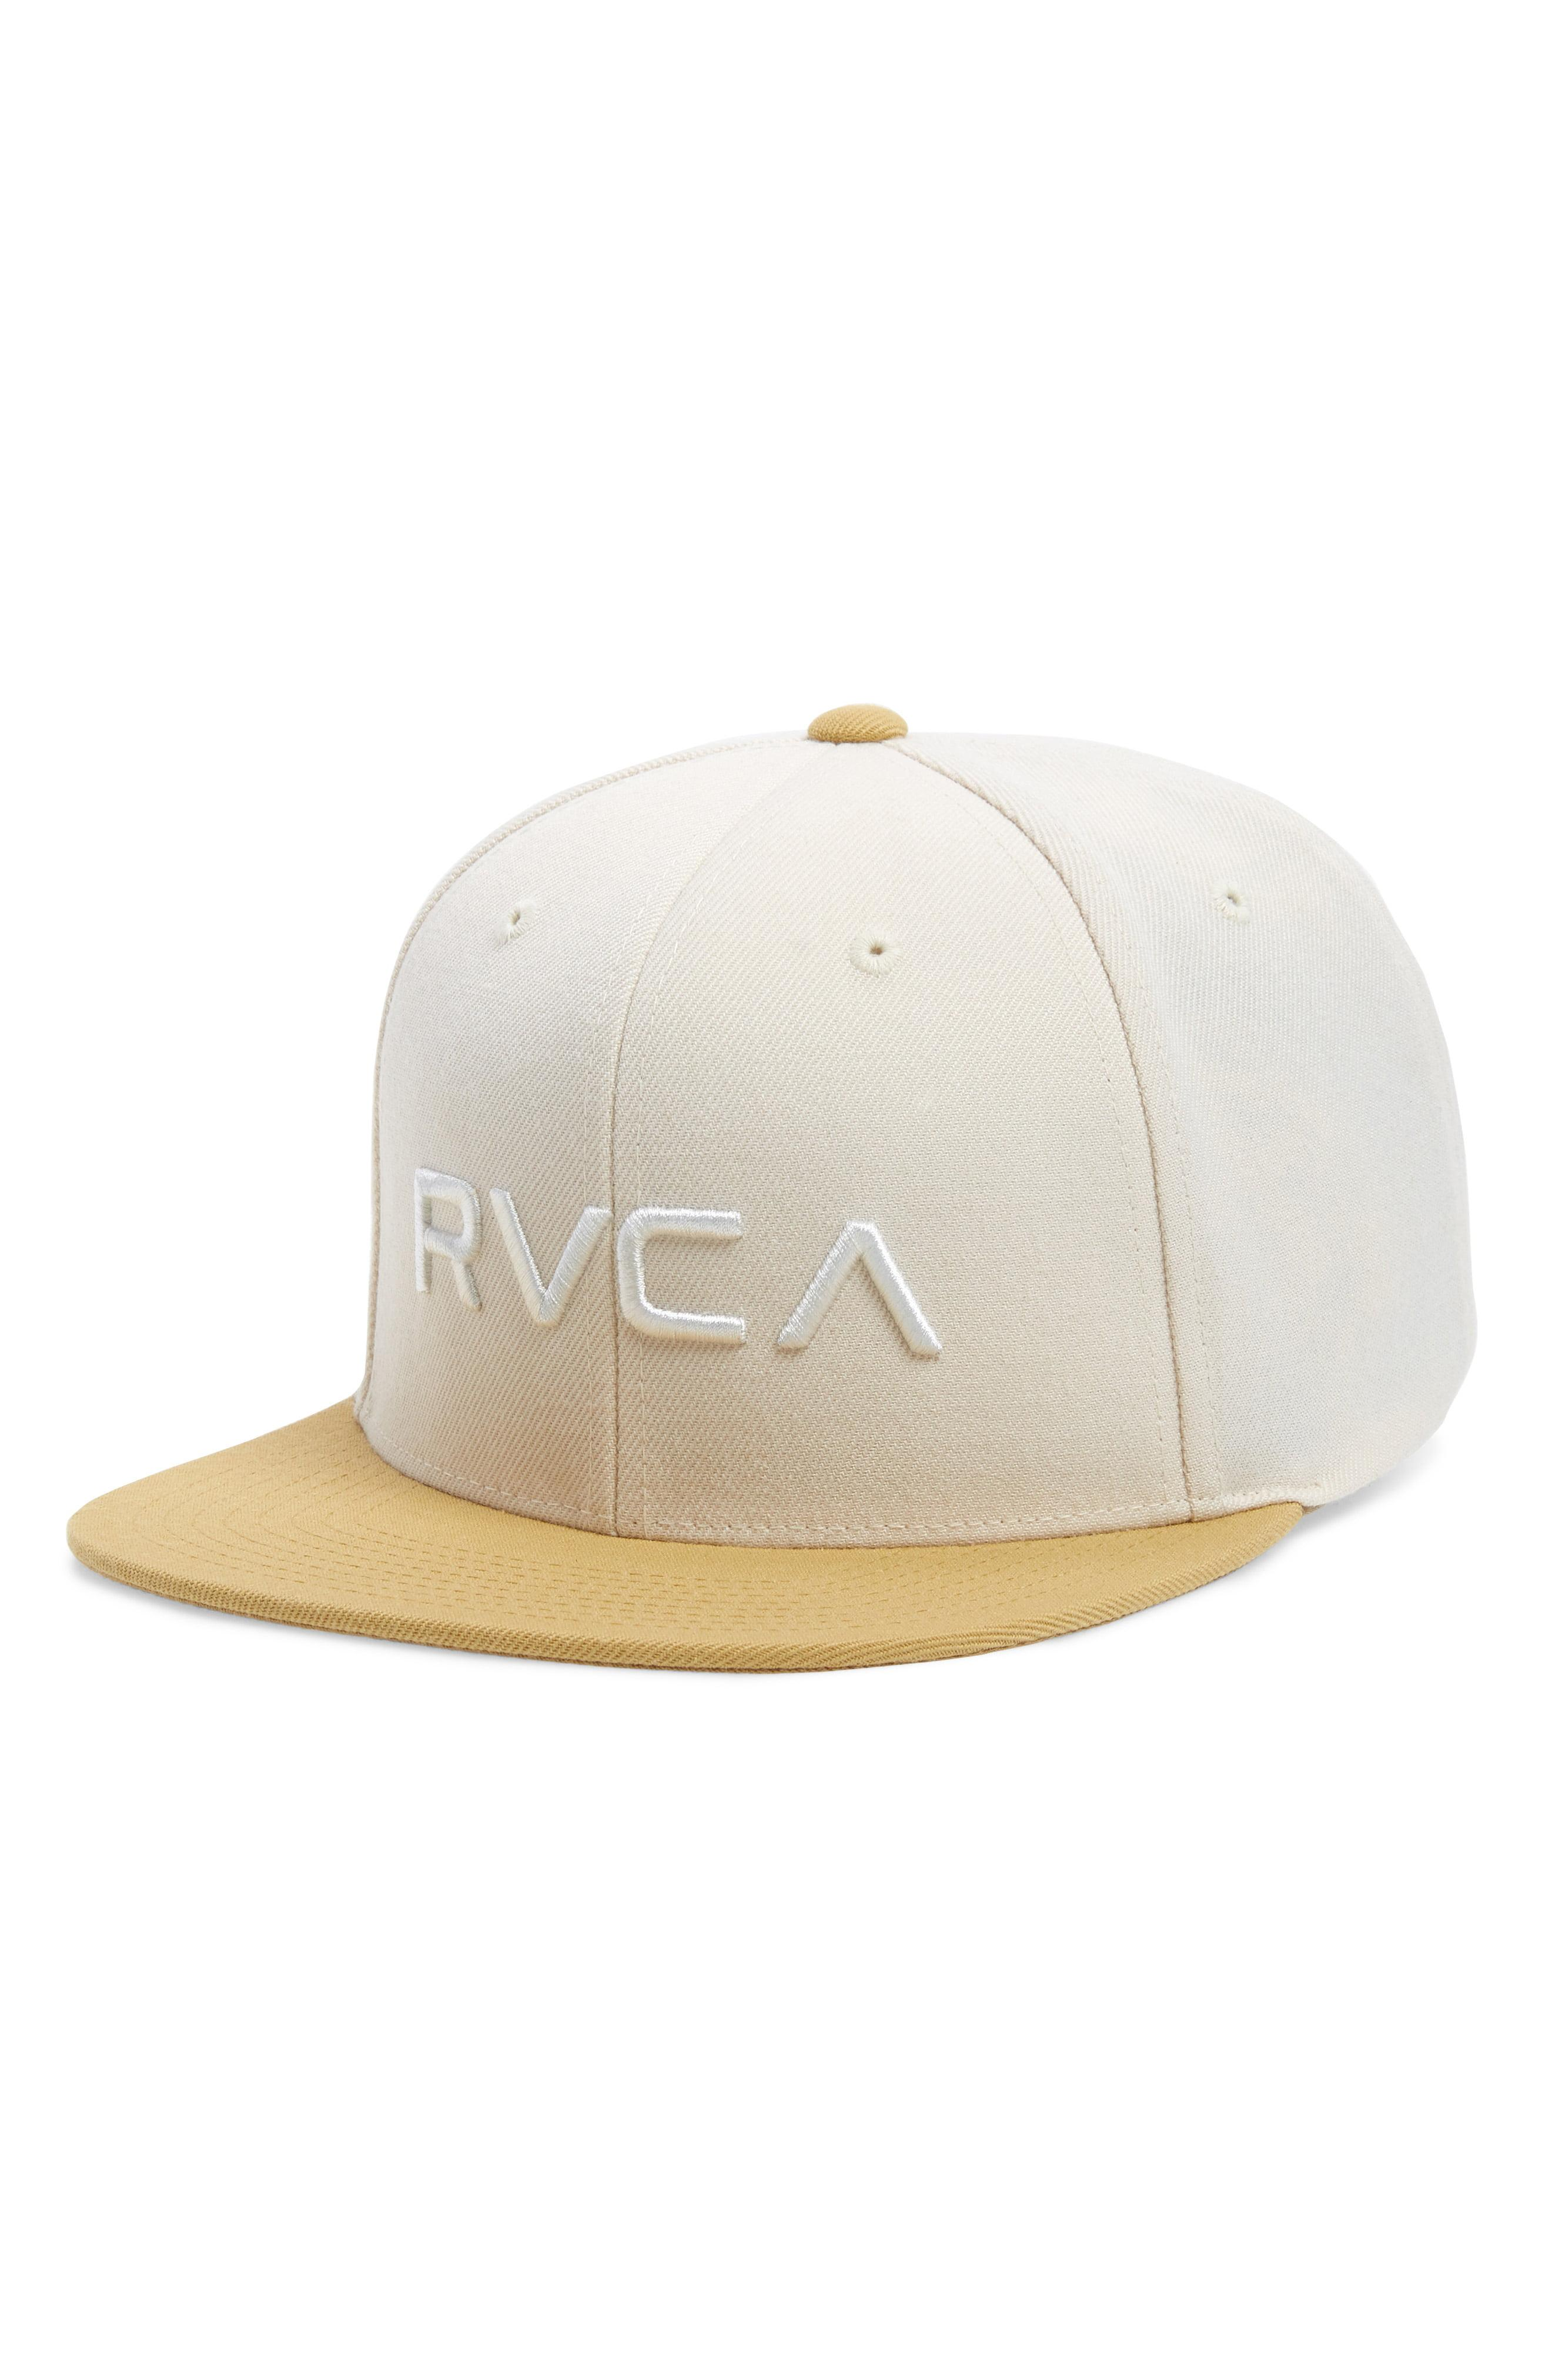 948dfe7b Lyst - RVCA Twill Snapback Baseball Cap in White for Men